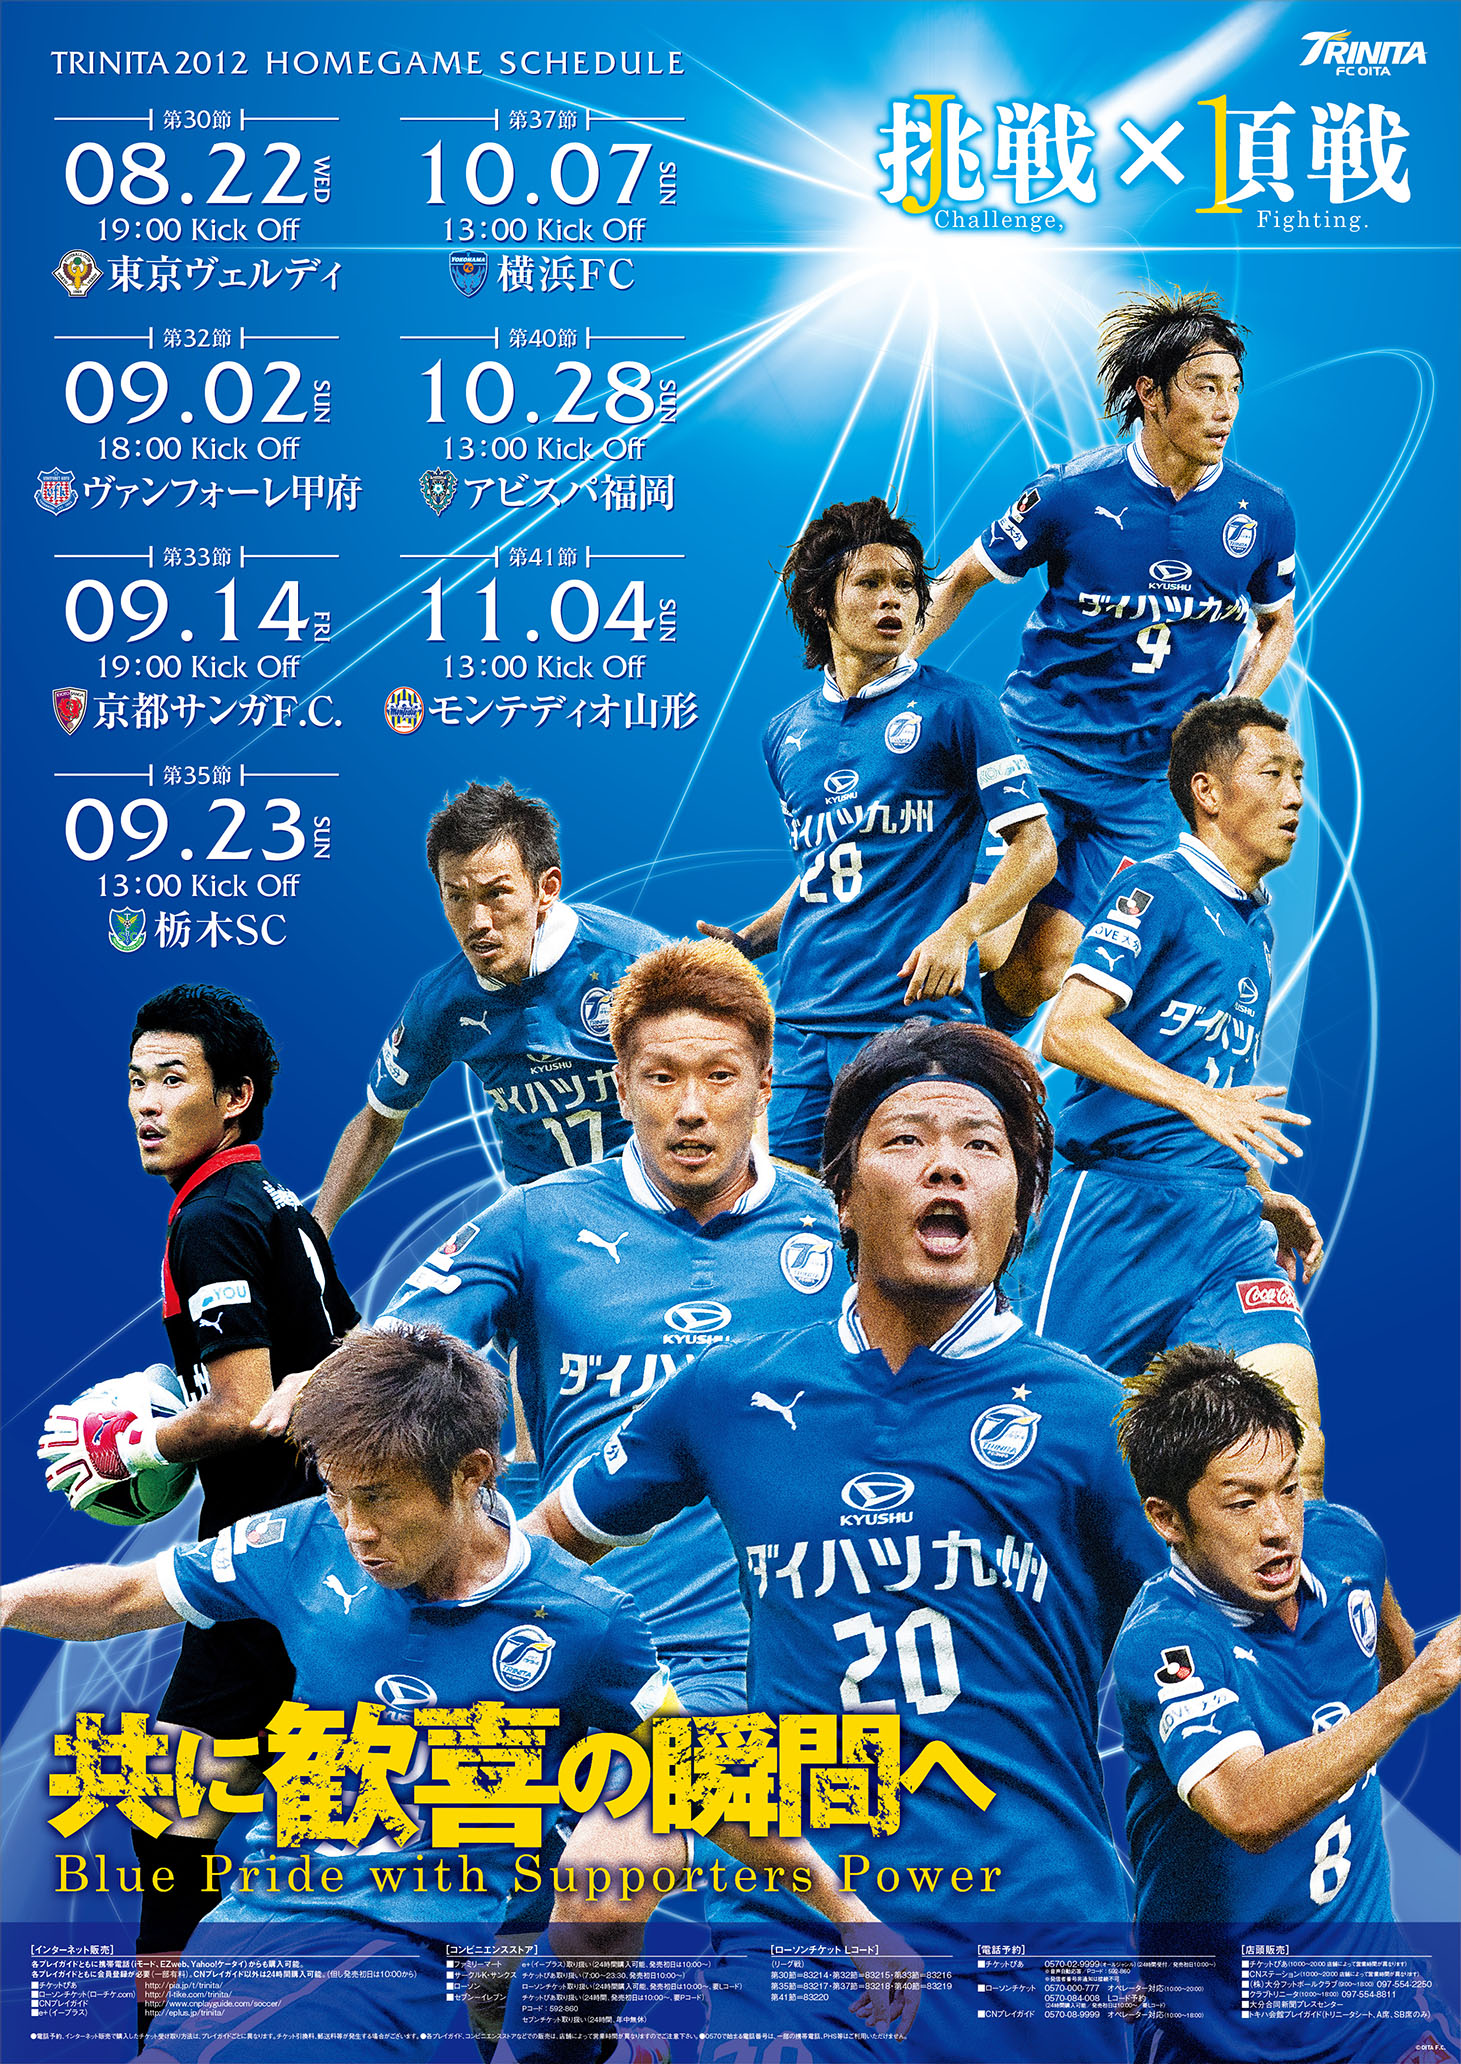 OITA TRINITA 2012後期試合日程ポスター